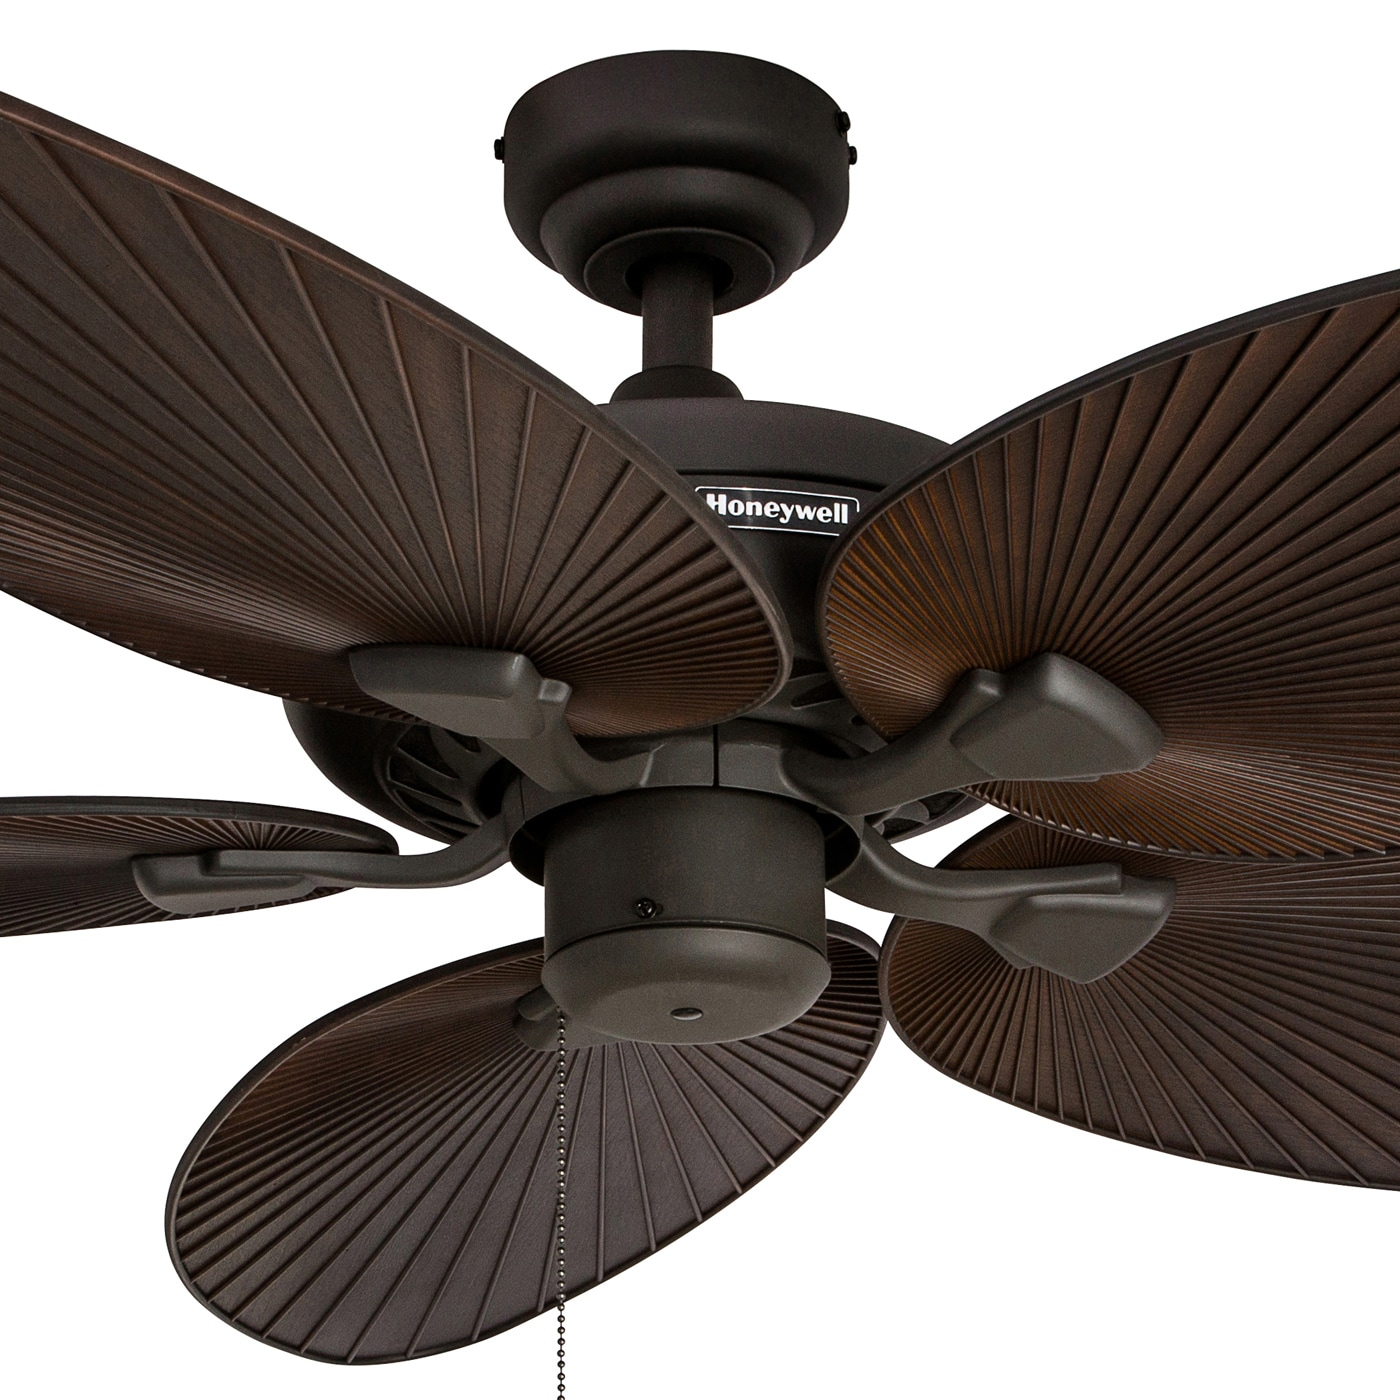 Honeywell palm island bronze 52 inch ceiling fan with palm blades honeywell palm island bronze 52 inch ceiling fan with palm blades free shipping today overstock 22393887 aloadofball Choice Image